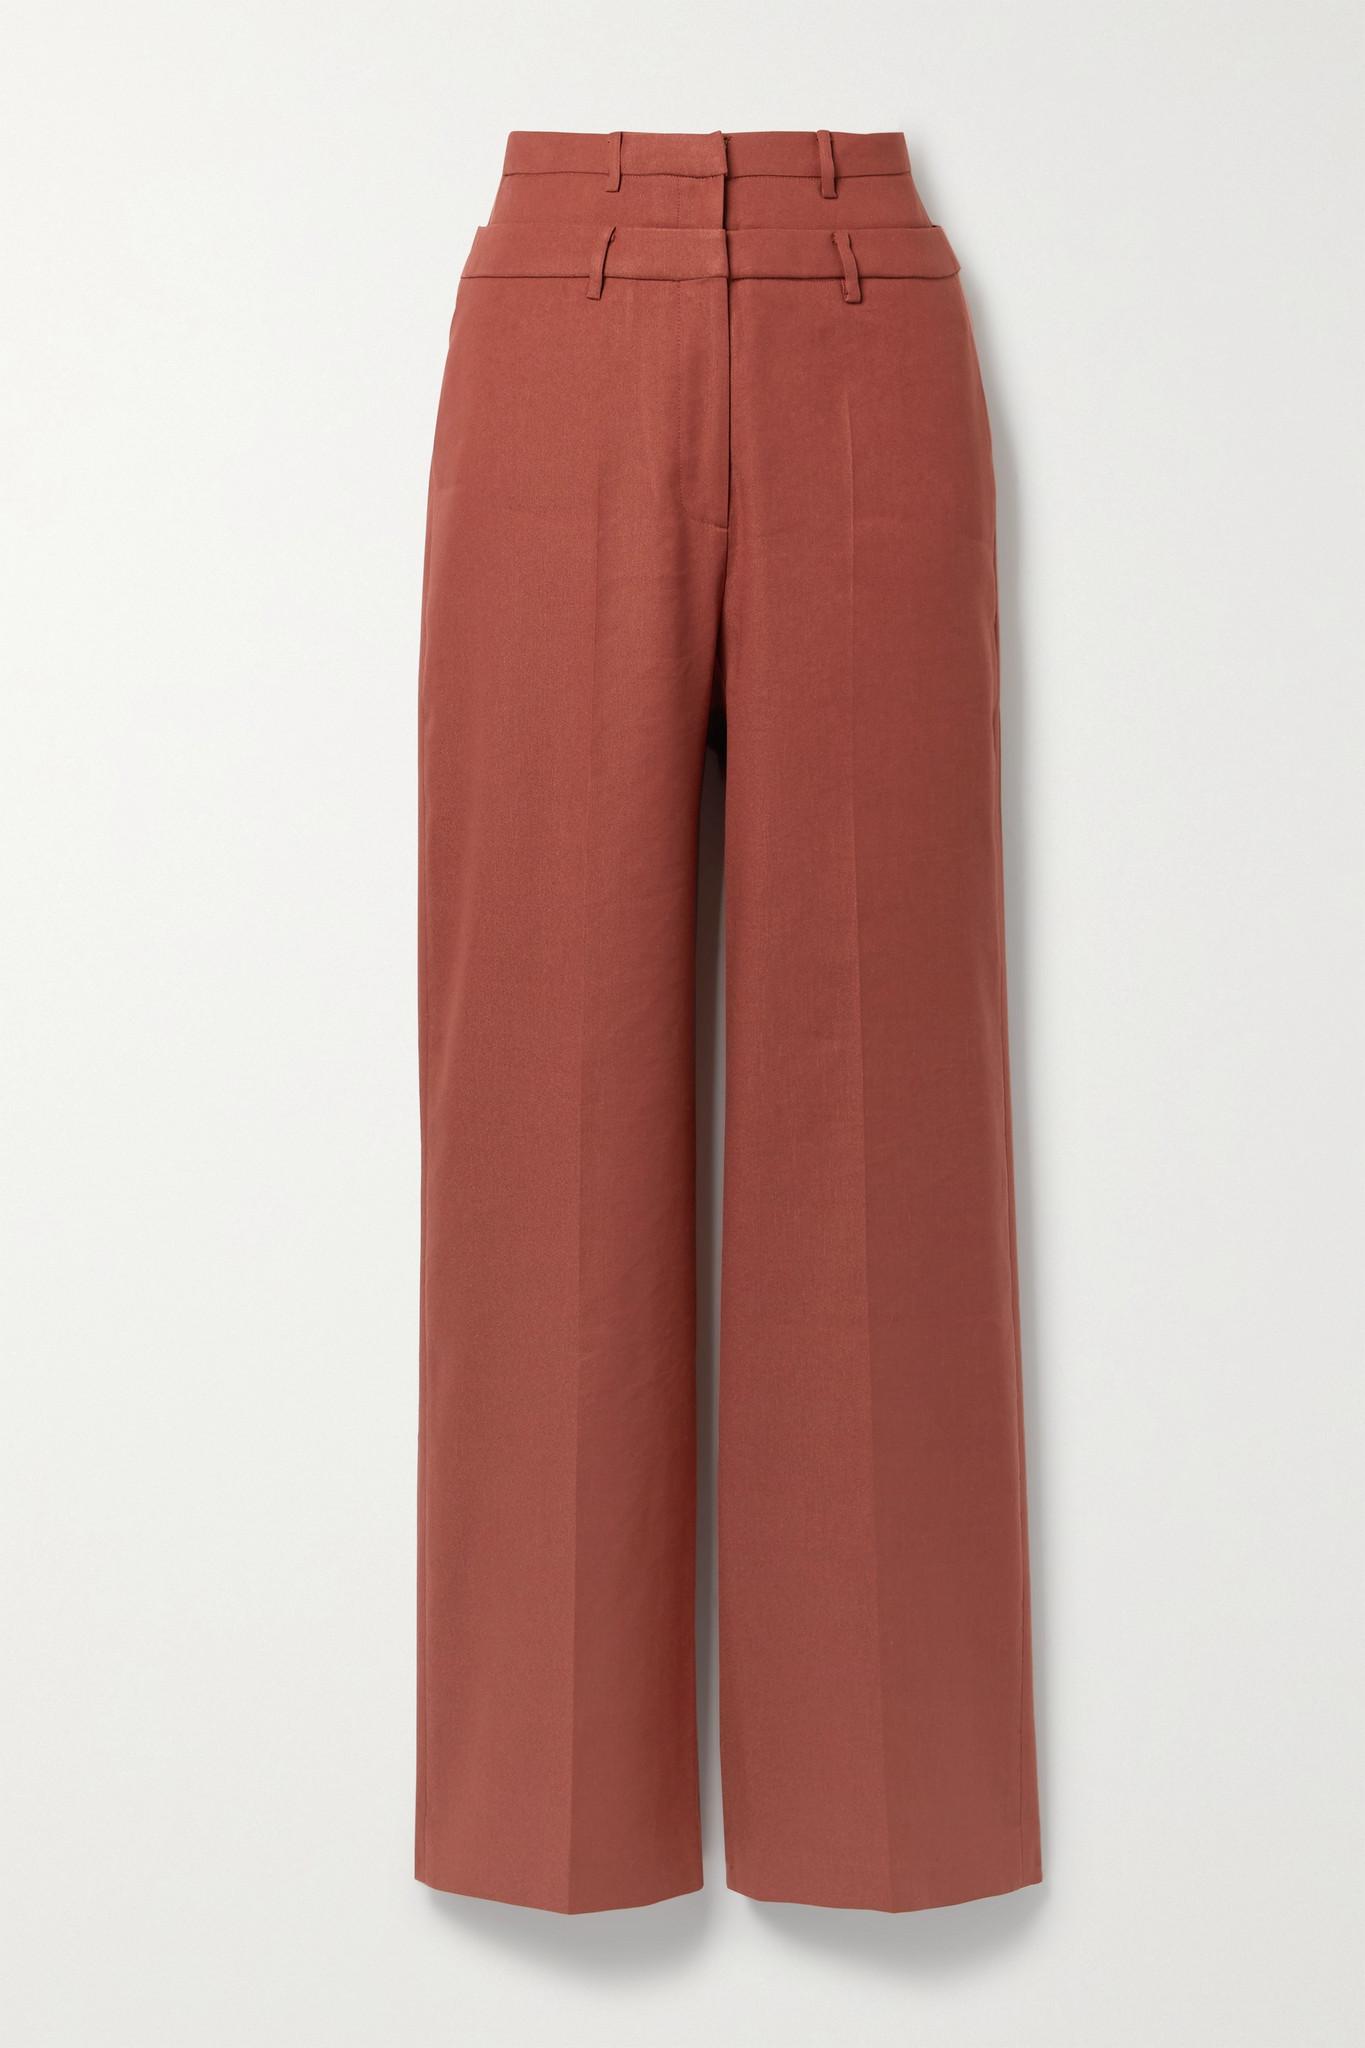 REJINA PYO - Laila 亚麻混纺斜纹布阔腿裤 - 红色 - UK10